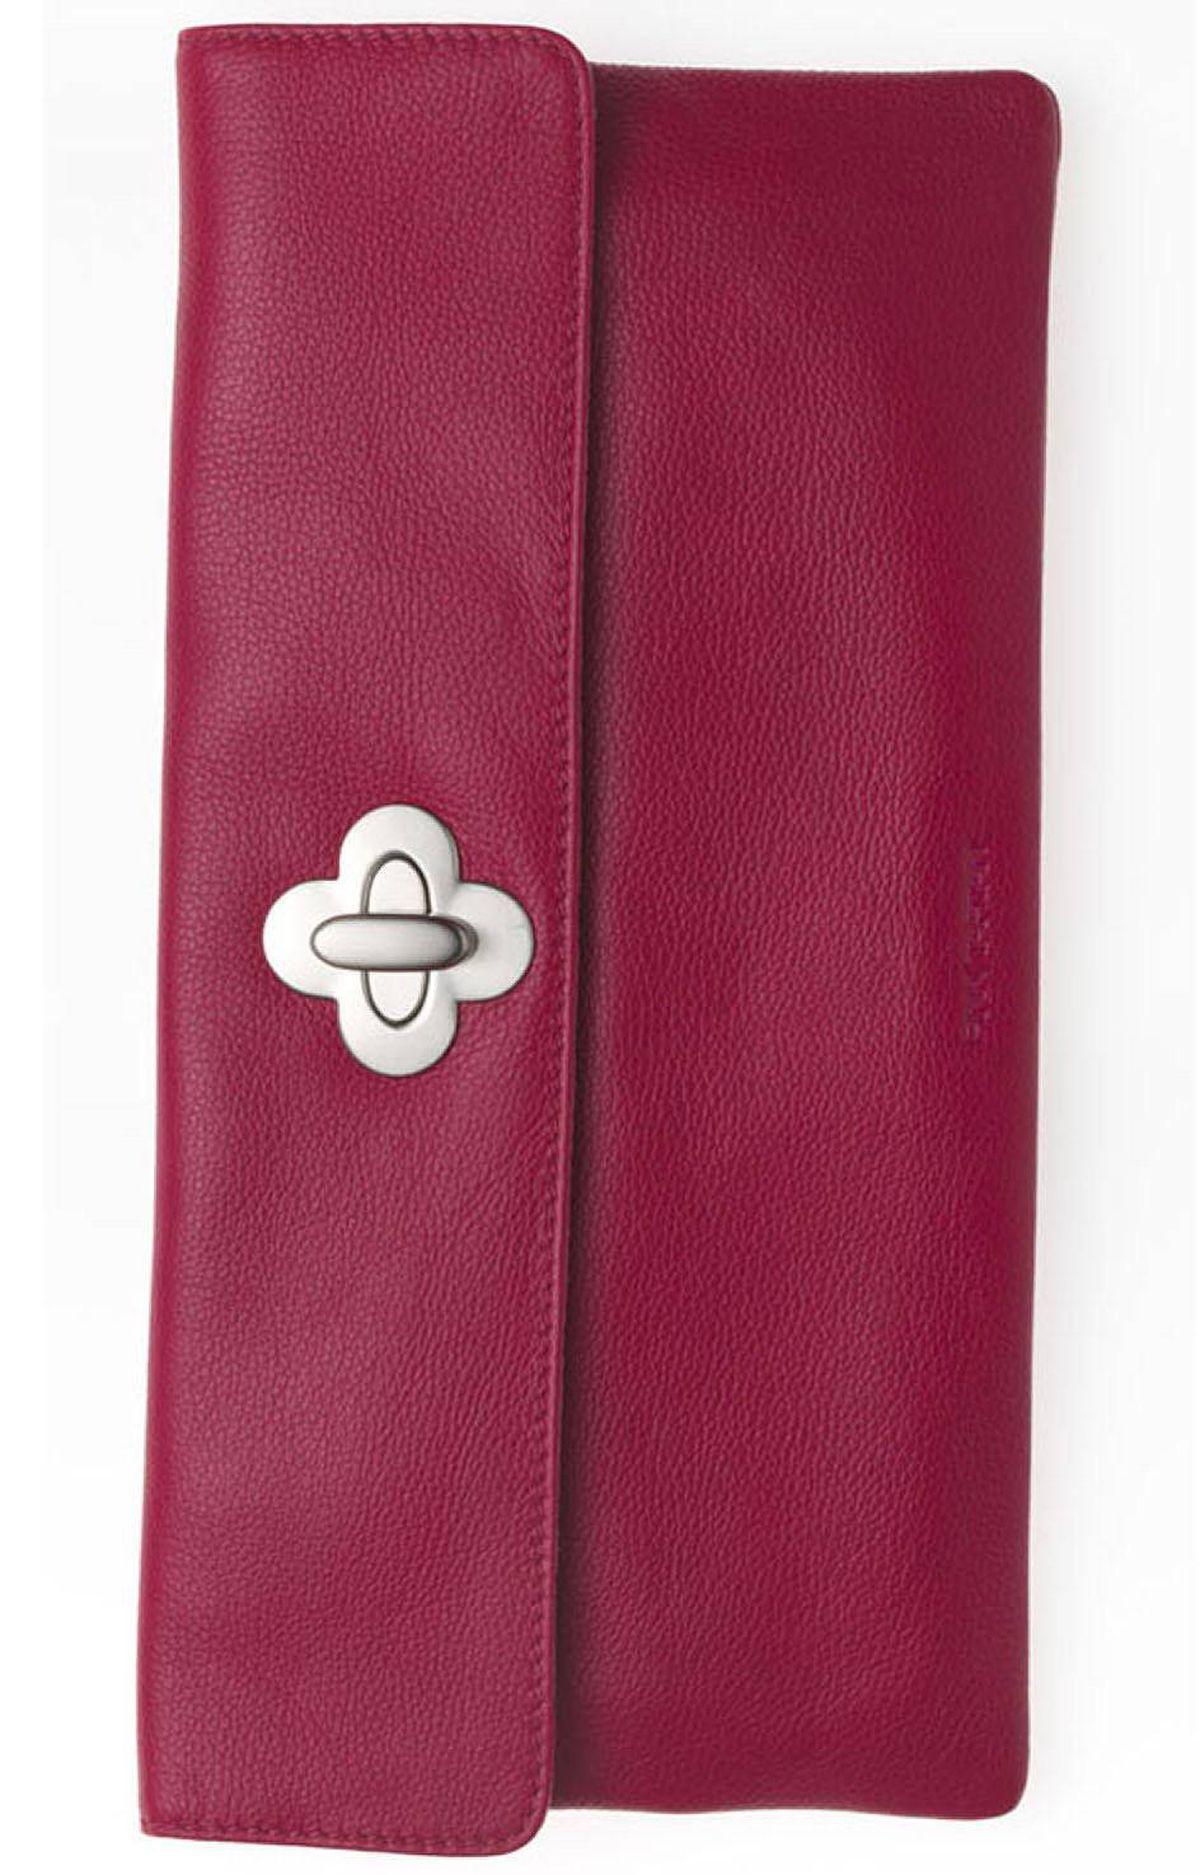 Pink leather Kimberley clutch by Pink Tartan, $195 through www.pinktartan.com.